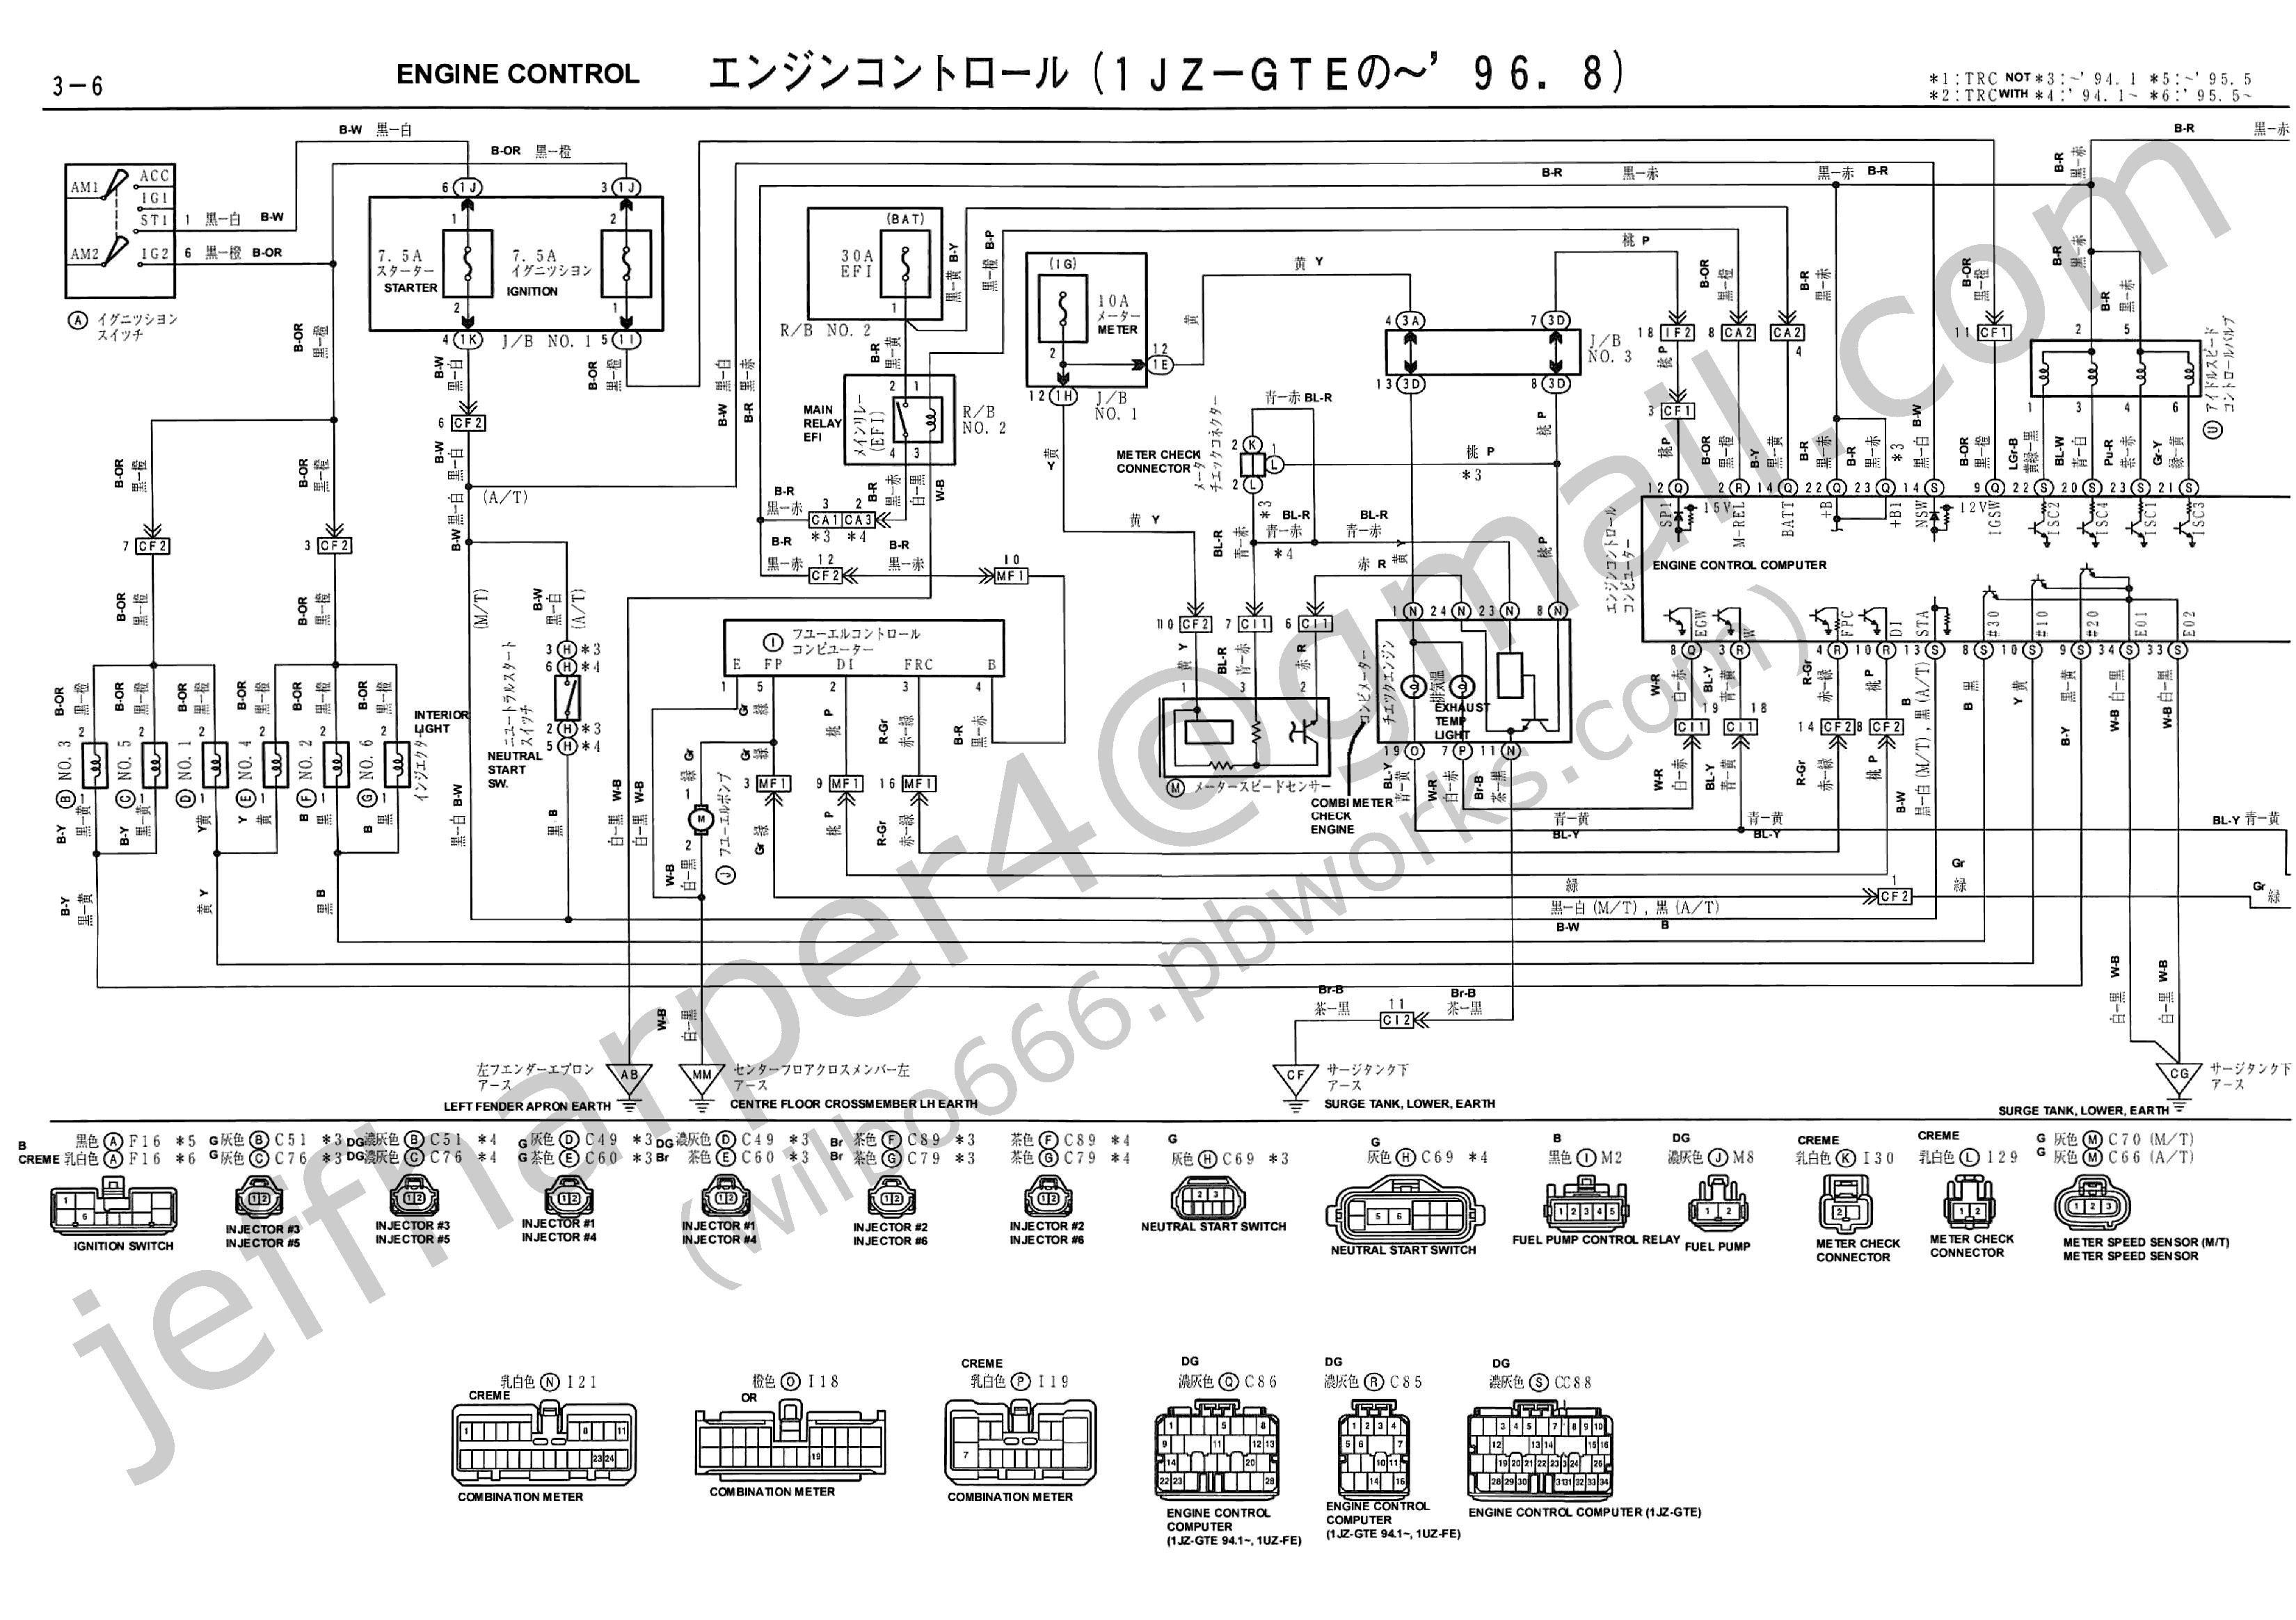 wilbo666 / 1JZ-GTE JZZ30 Soarer Engine Wiring in 2021